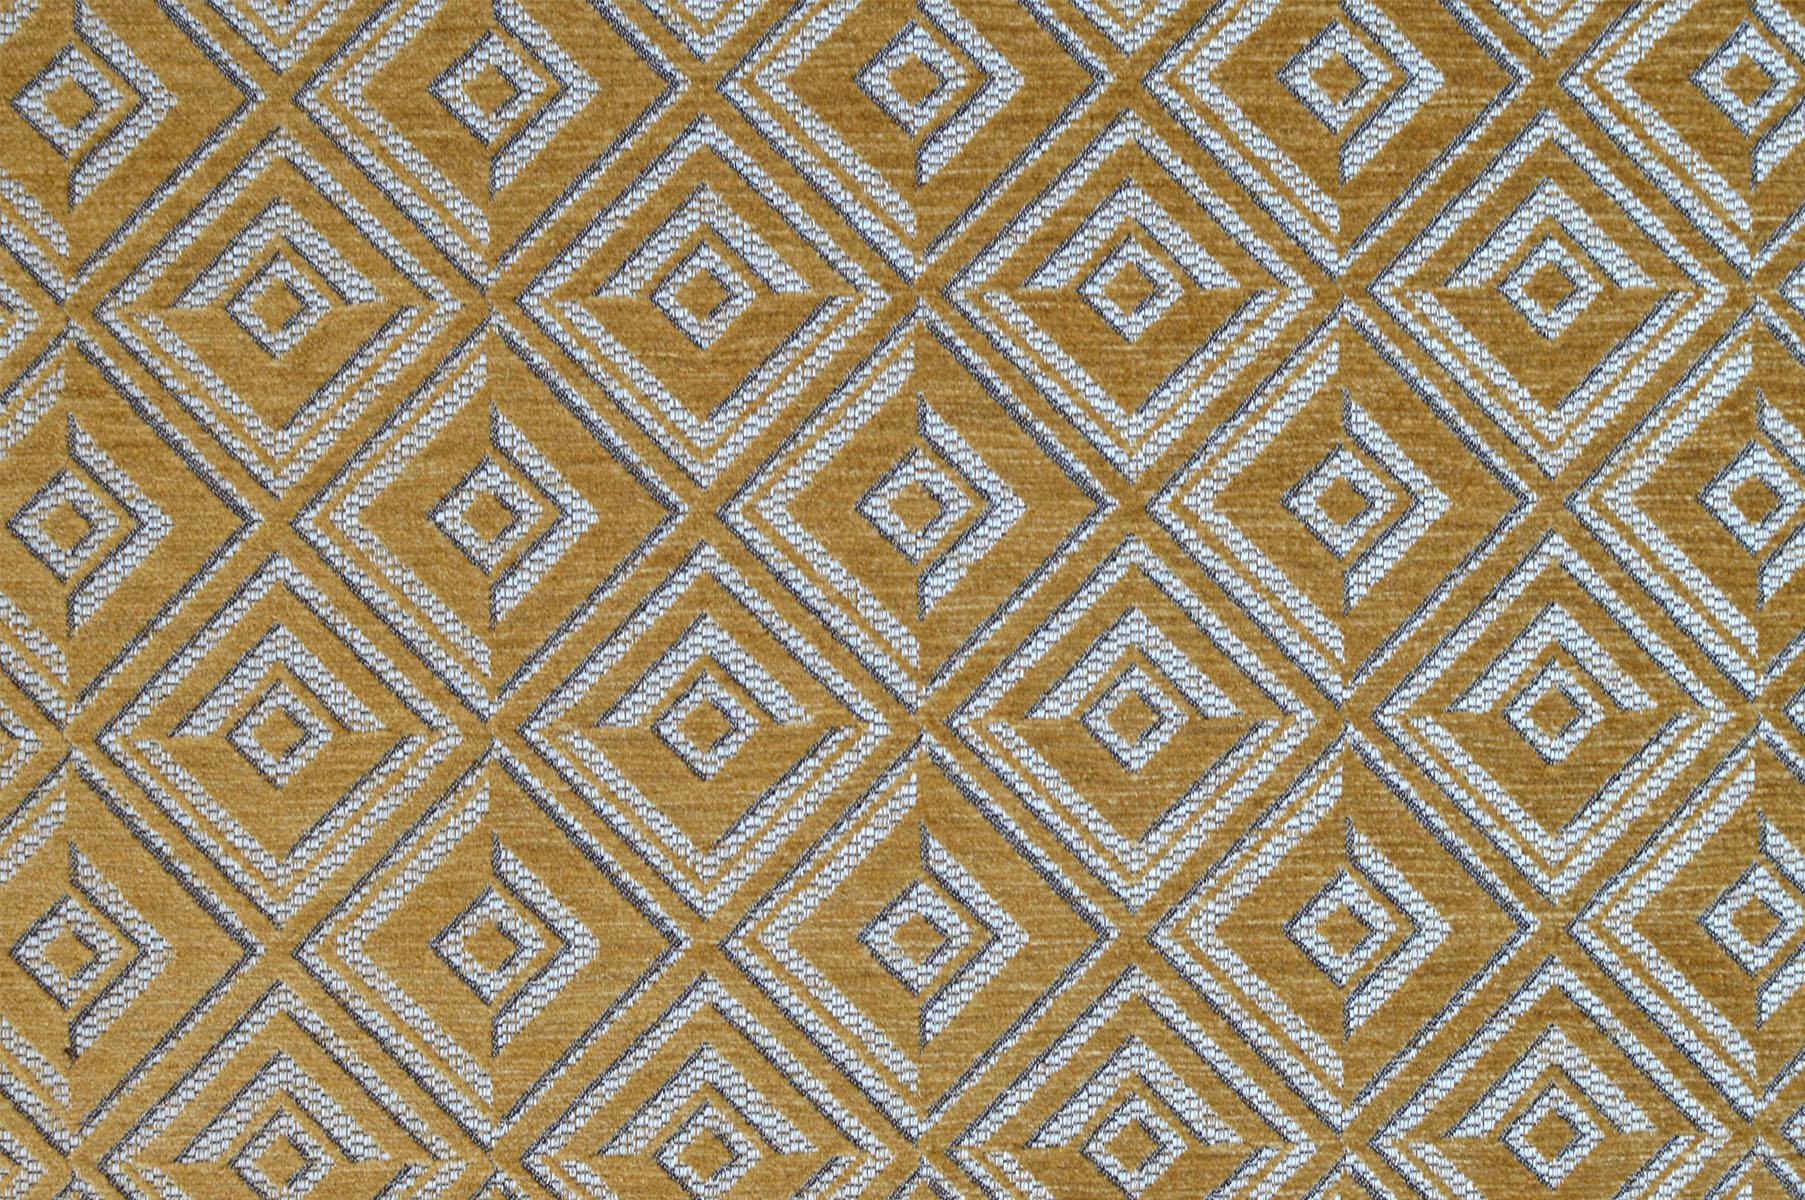 Colefax and Fowler Diamonds Curtain Fabric 2